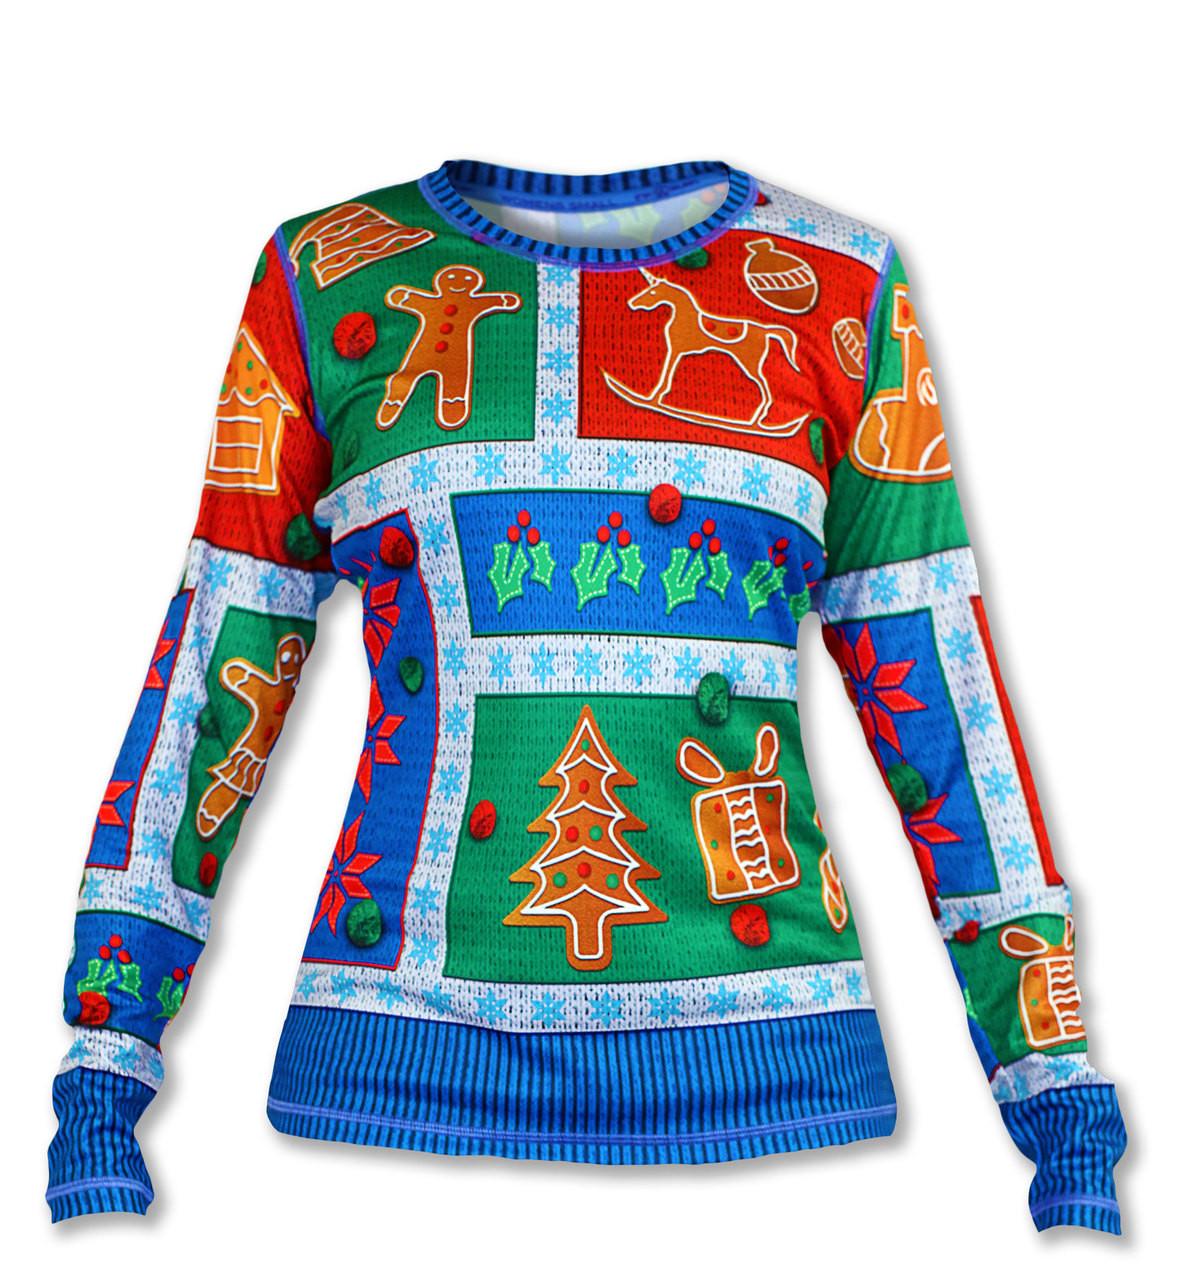 INKnBURN Women's 2017 Holiday Sweater Long Sleeve Tech Shirt Front